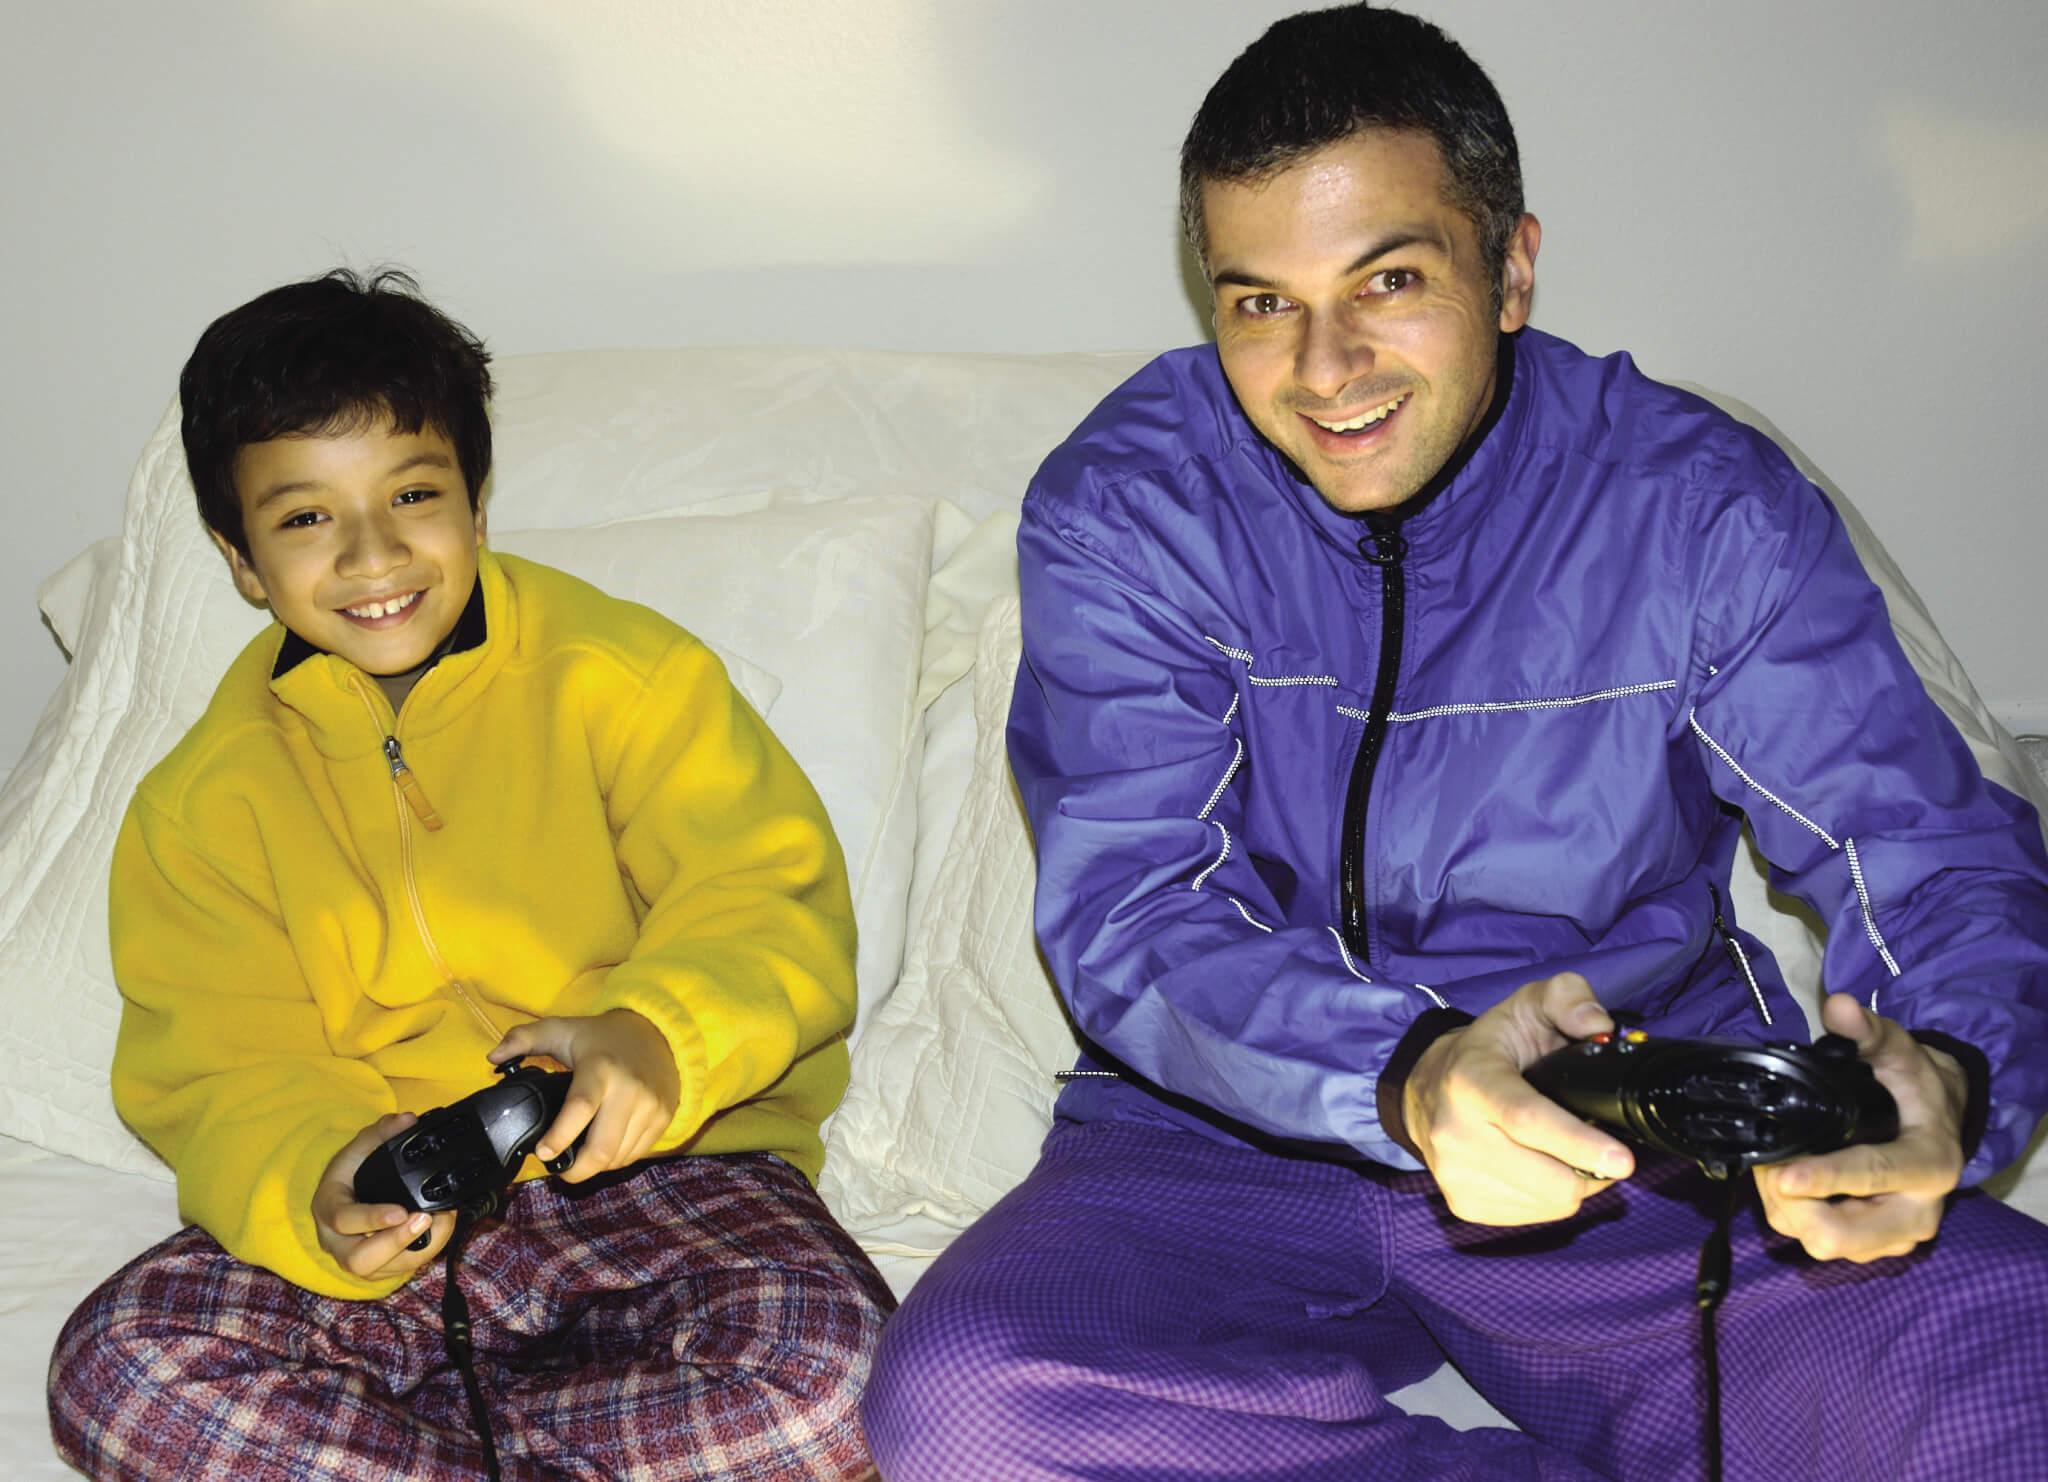 Video Game Marathon for Mentoring